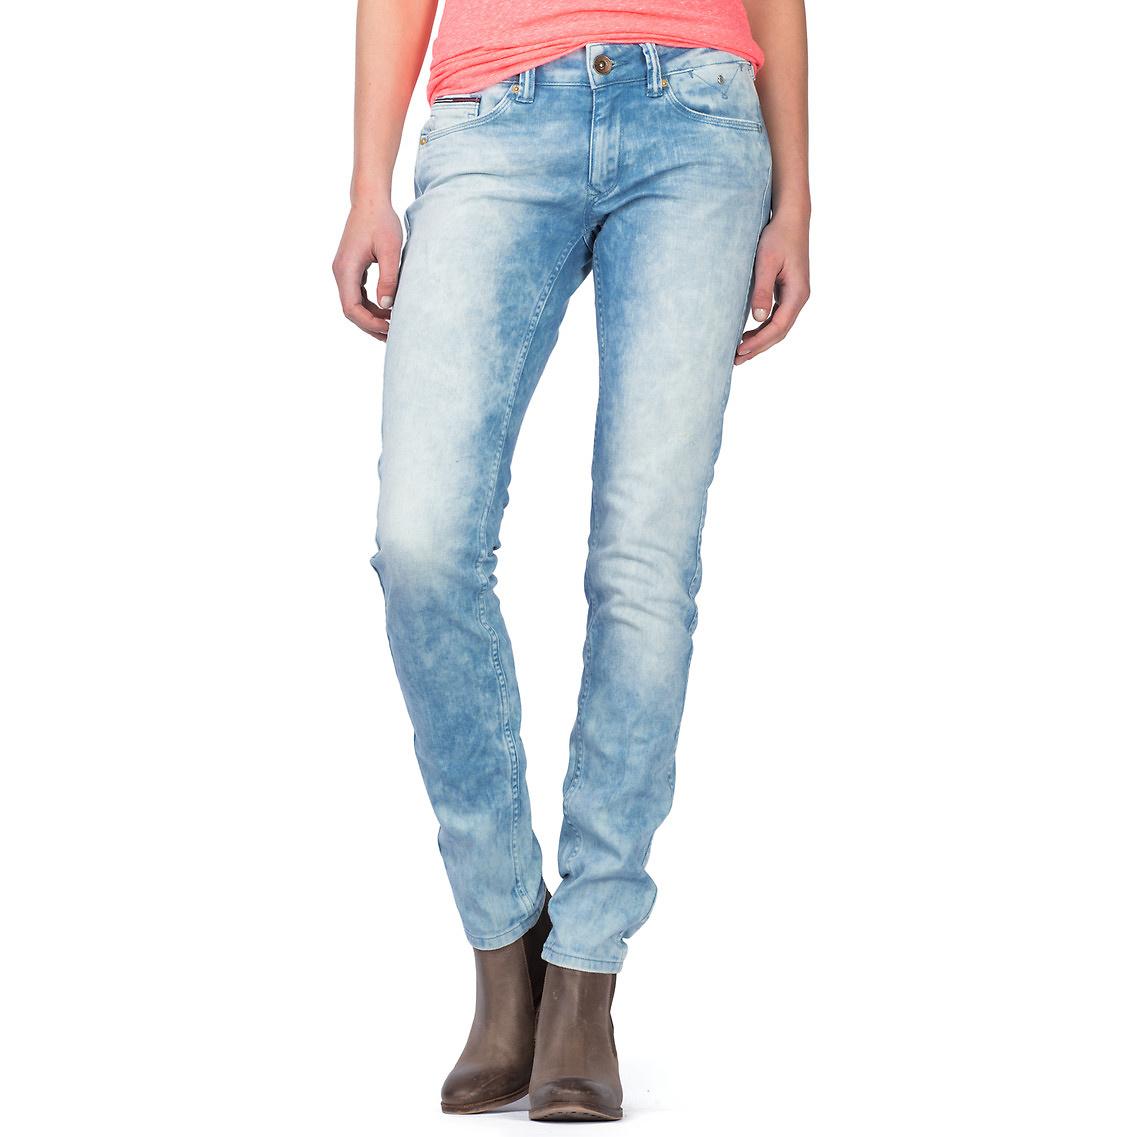 tukkukaupassa uusin muotoilu superlaatu Sophie Skinny Fit Jeans